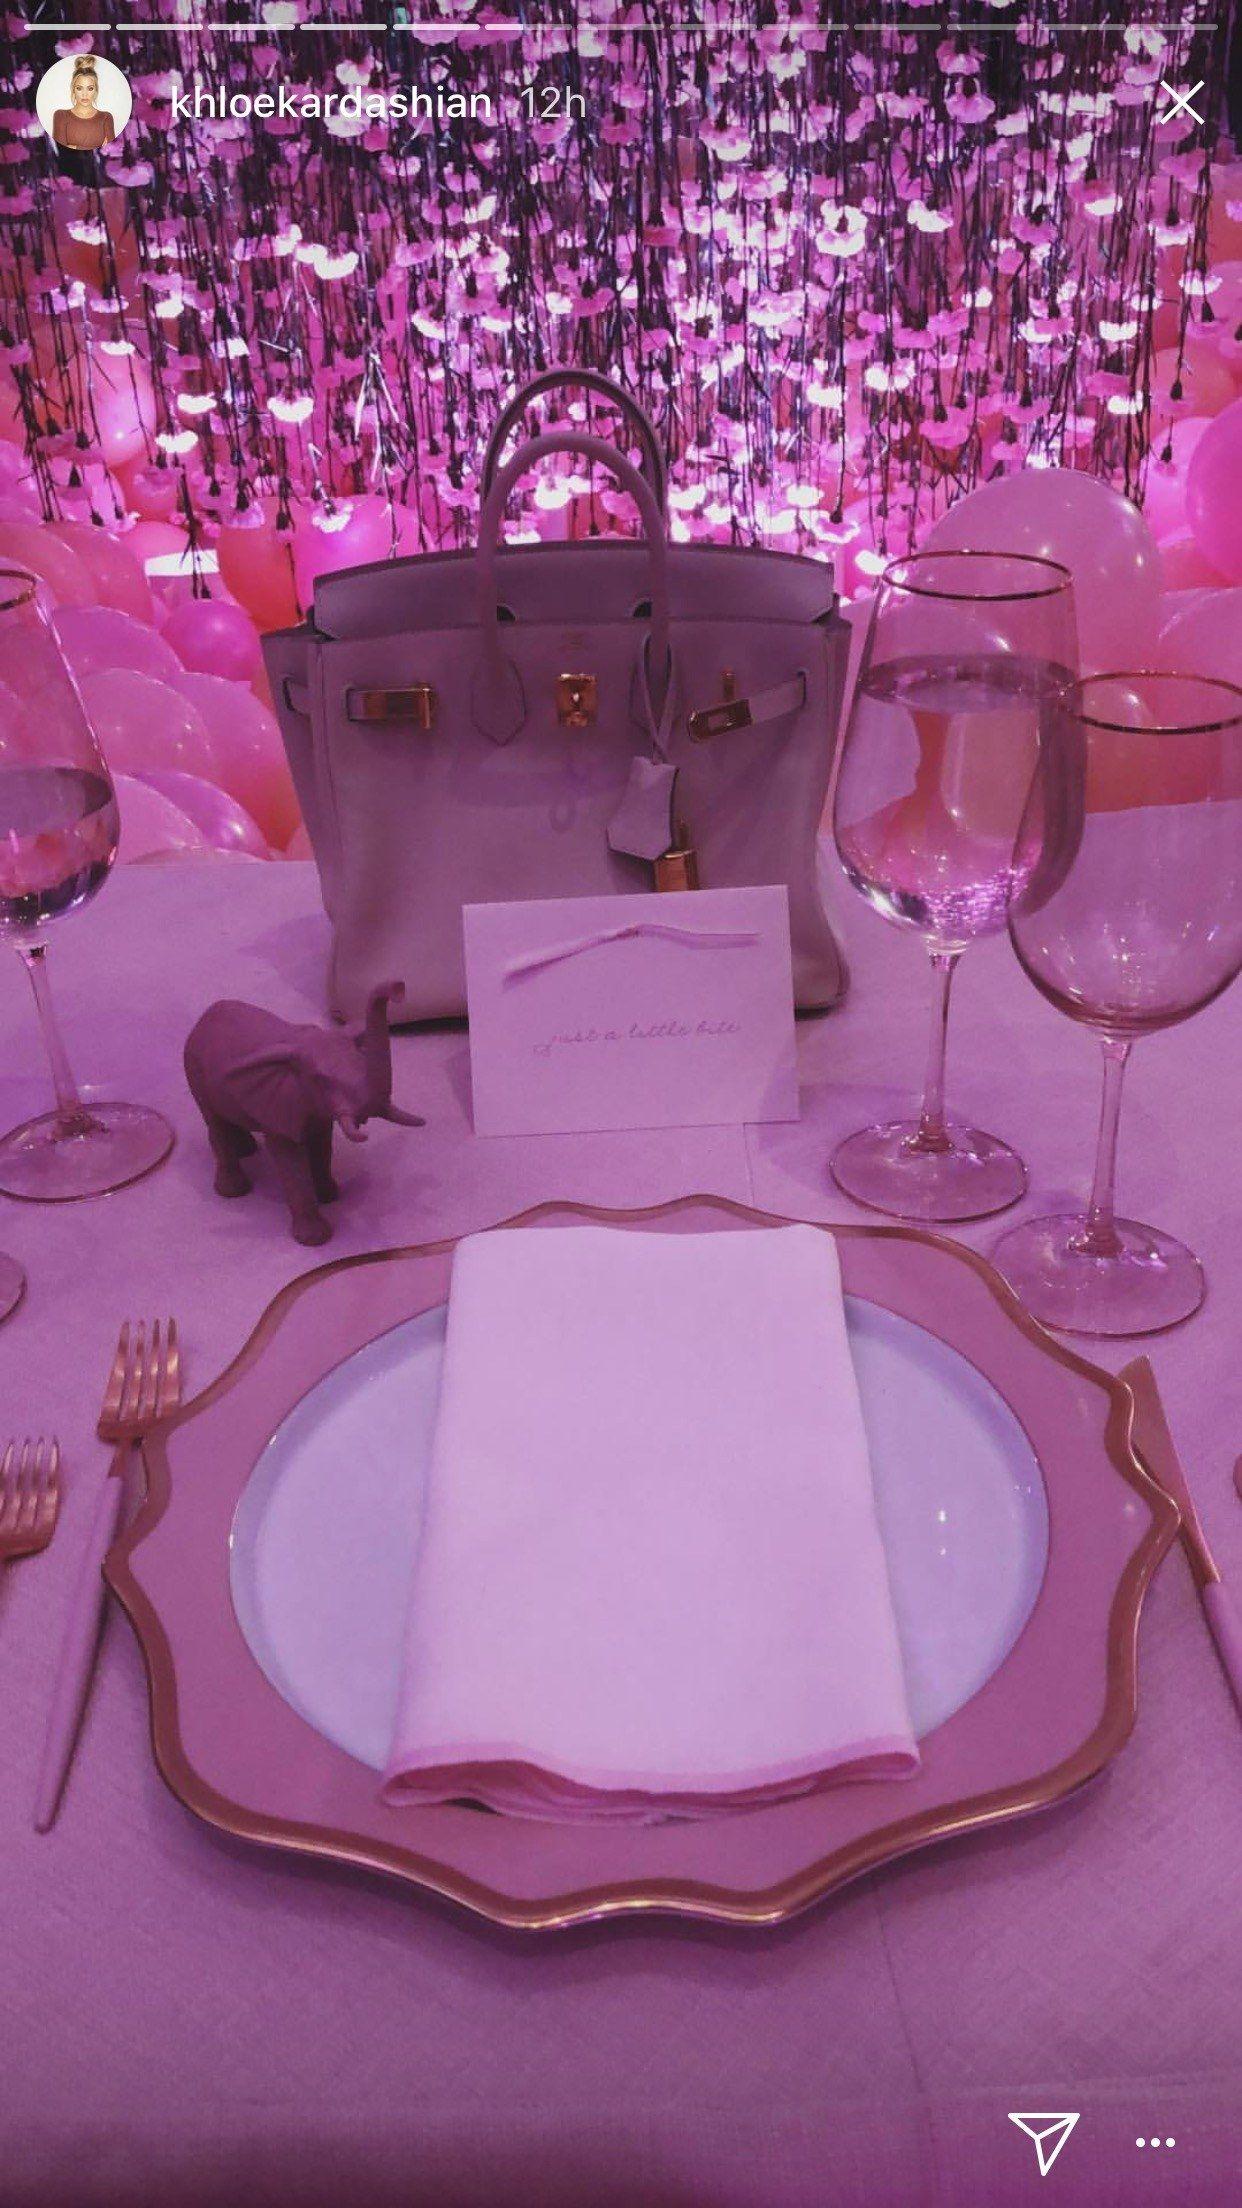 khloe kardashians baby shower might be the prettiest kardashian party ever